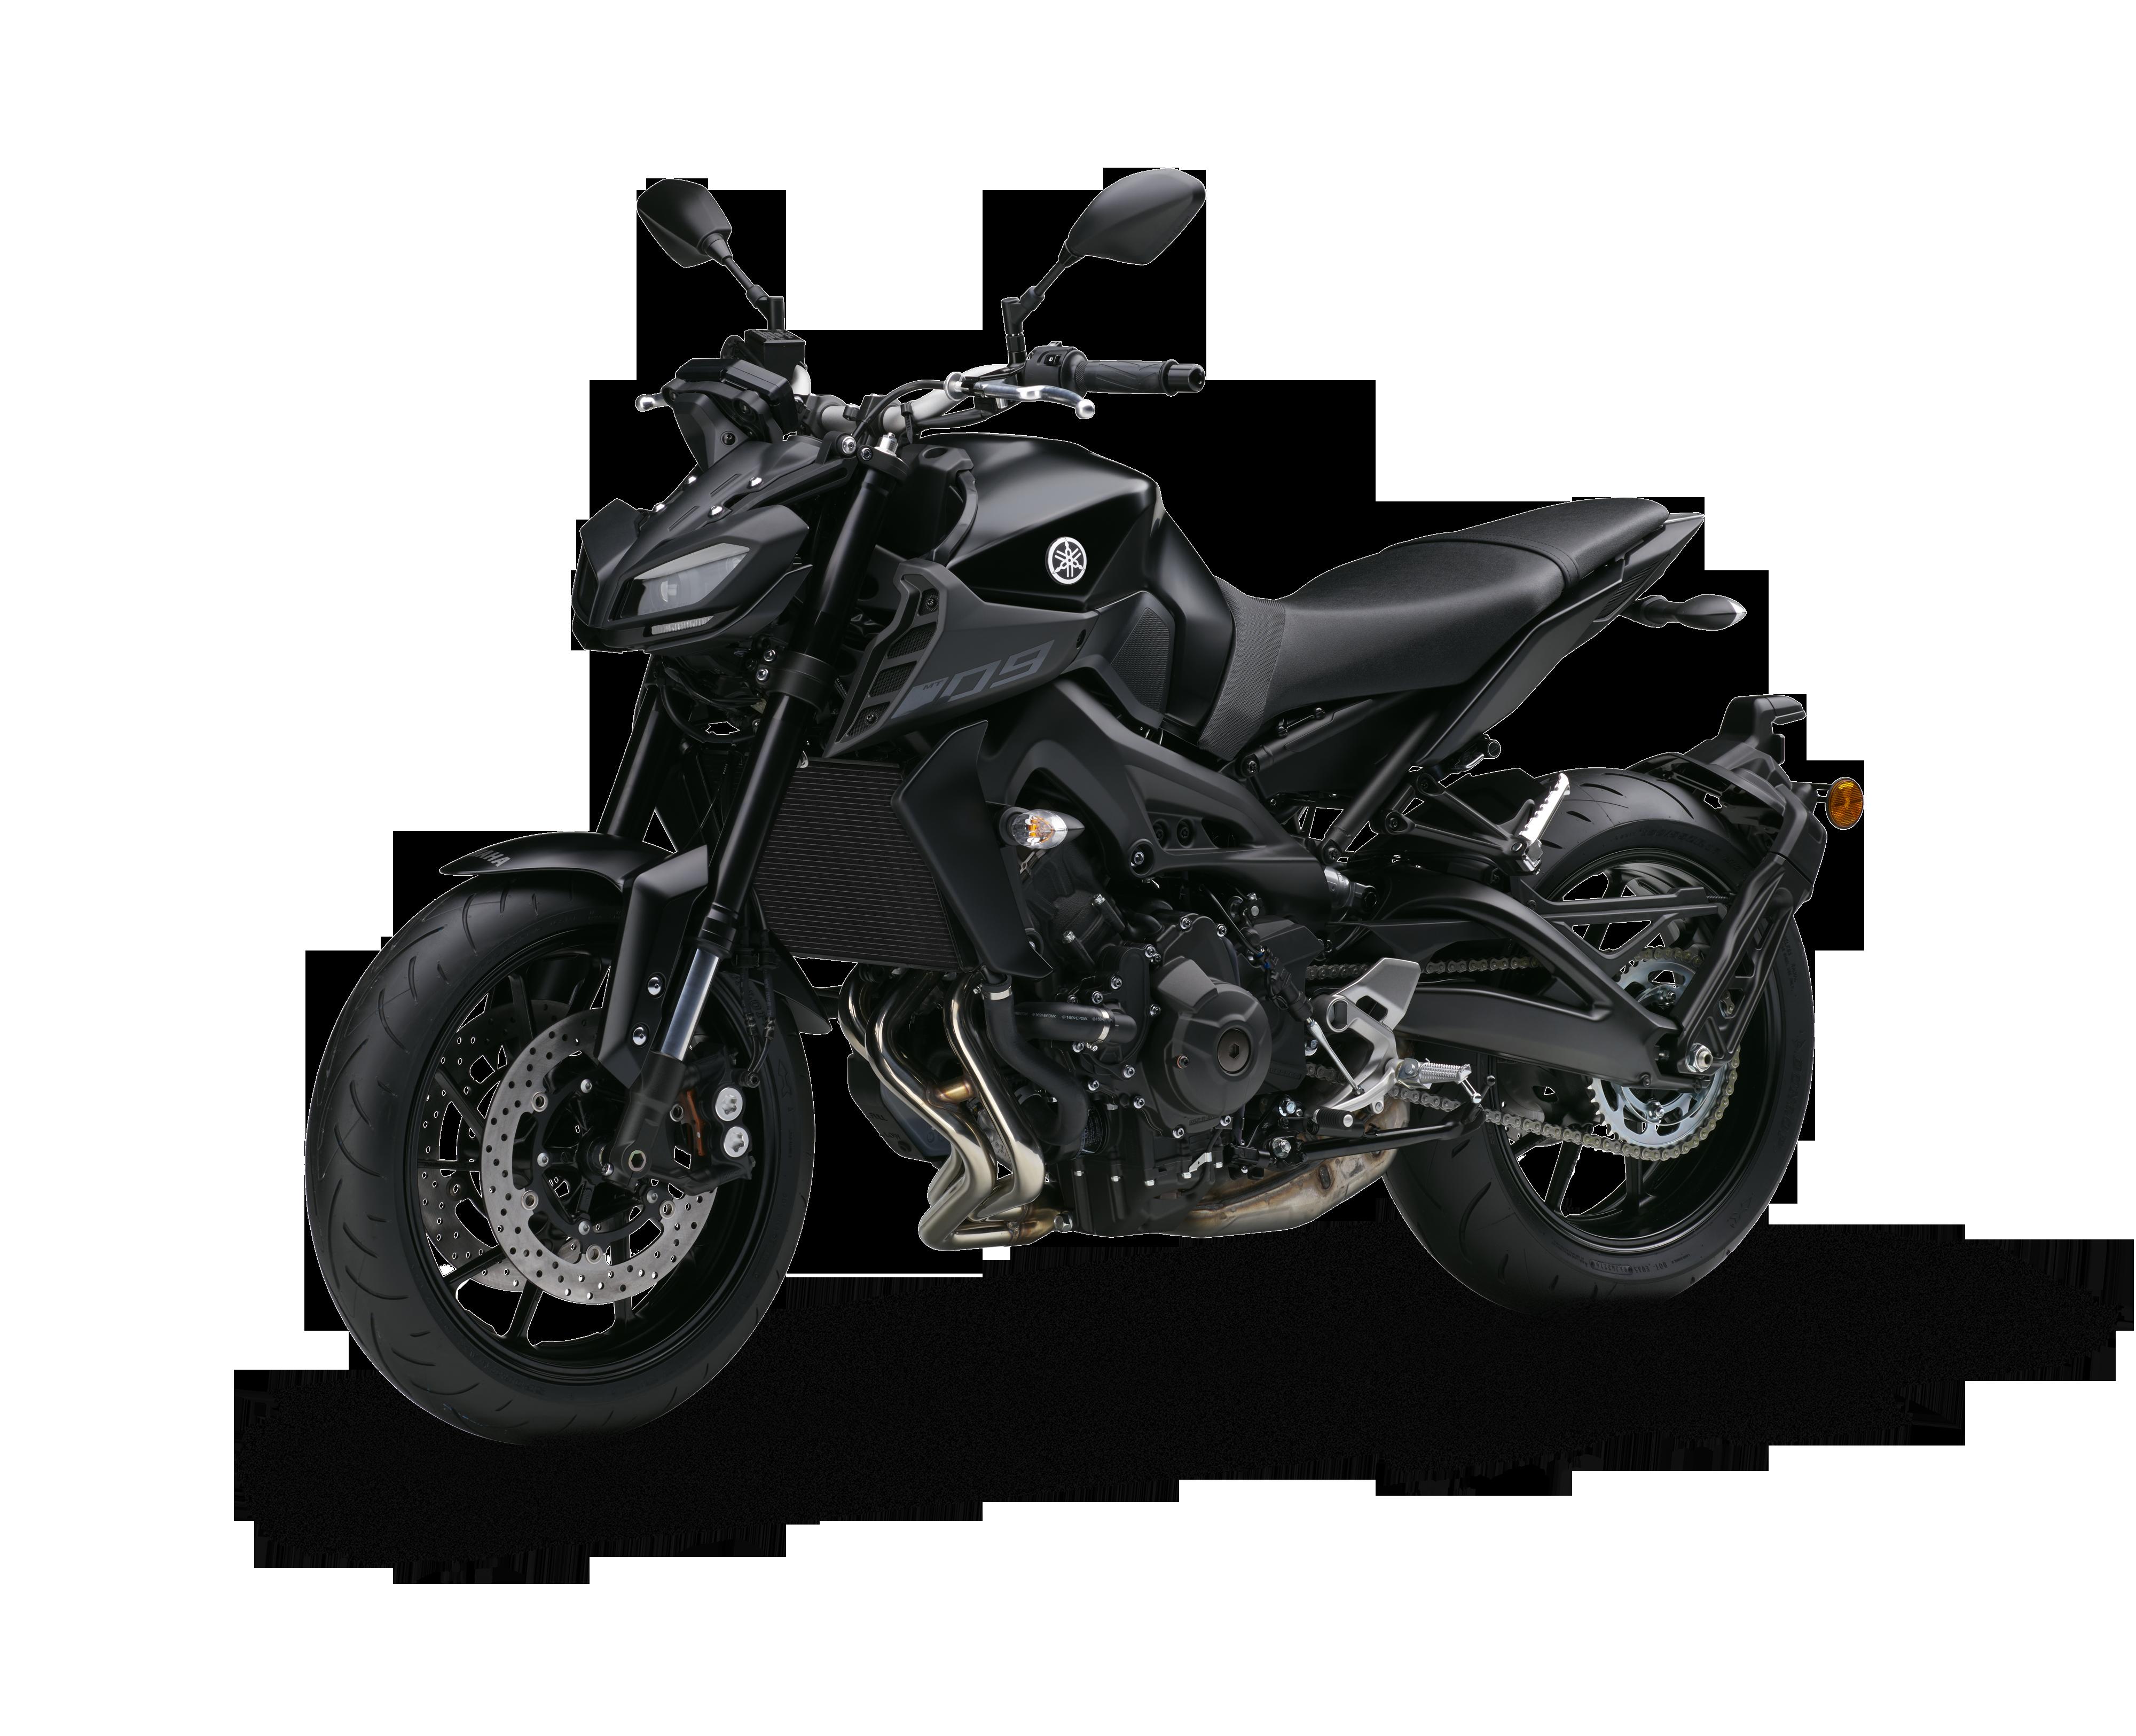 Moto_MT-09_2020_3-4_esquerda_matt-black.